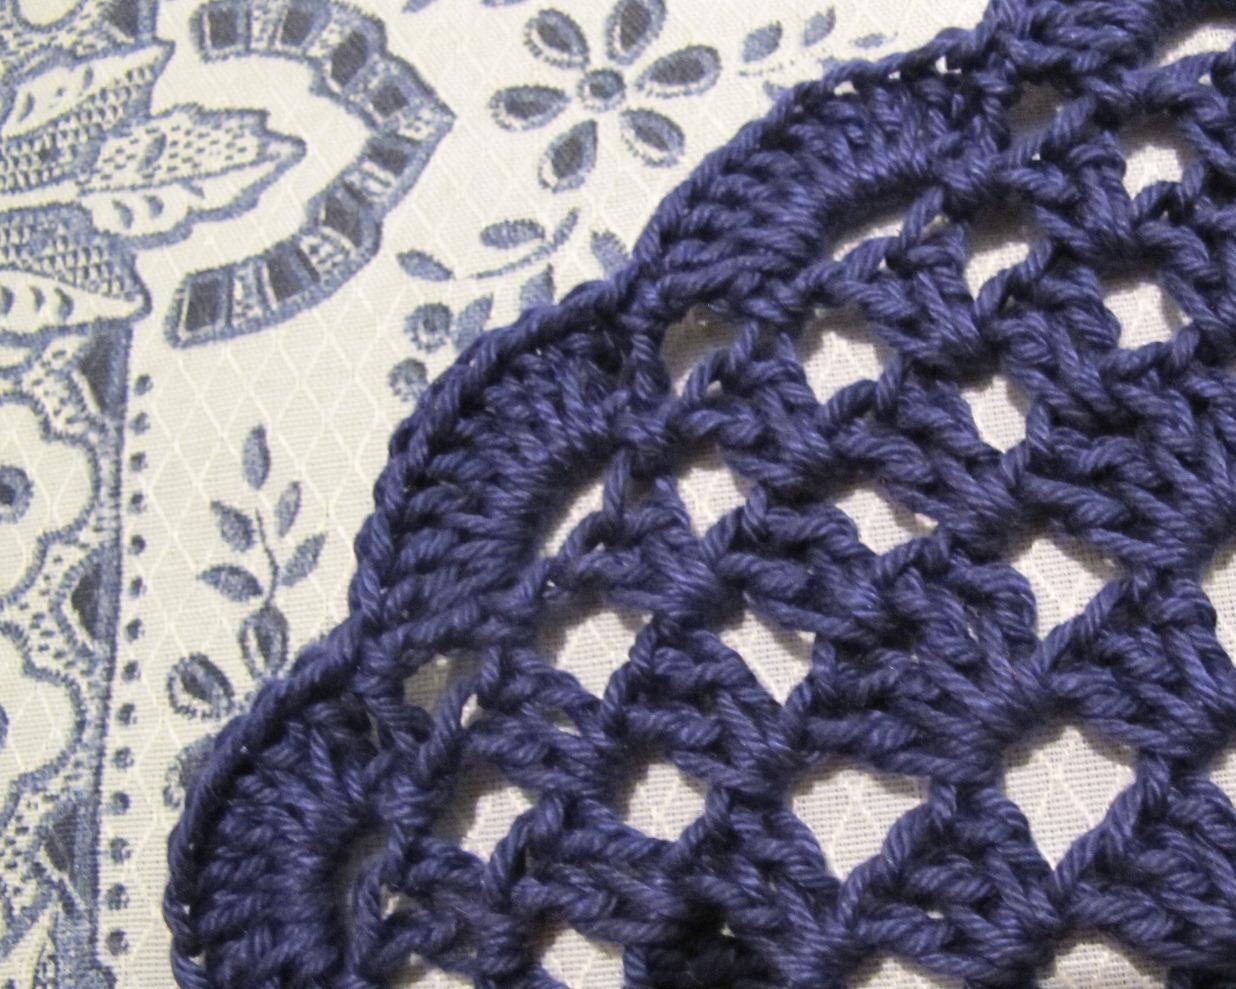 de crochet crochet moderno sousplat de crochet sousplat sousplat de  #454568 1236x989